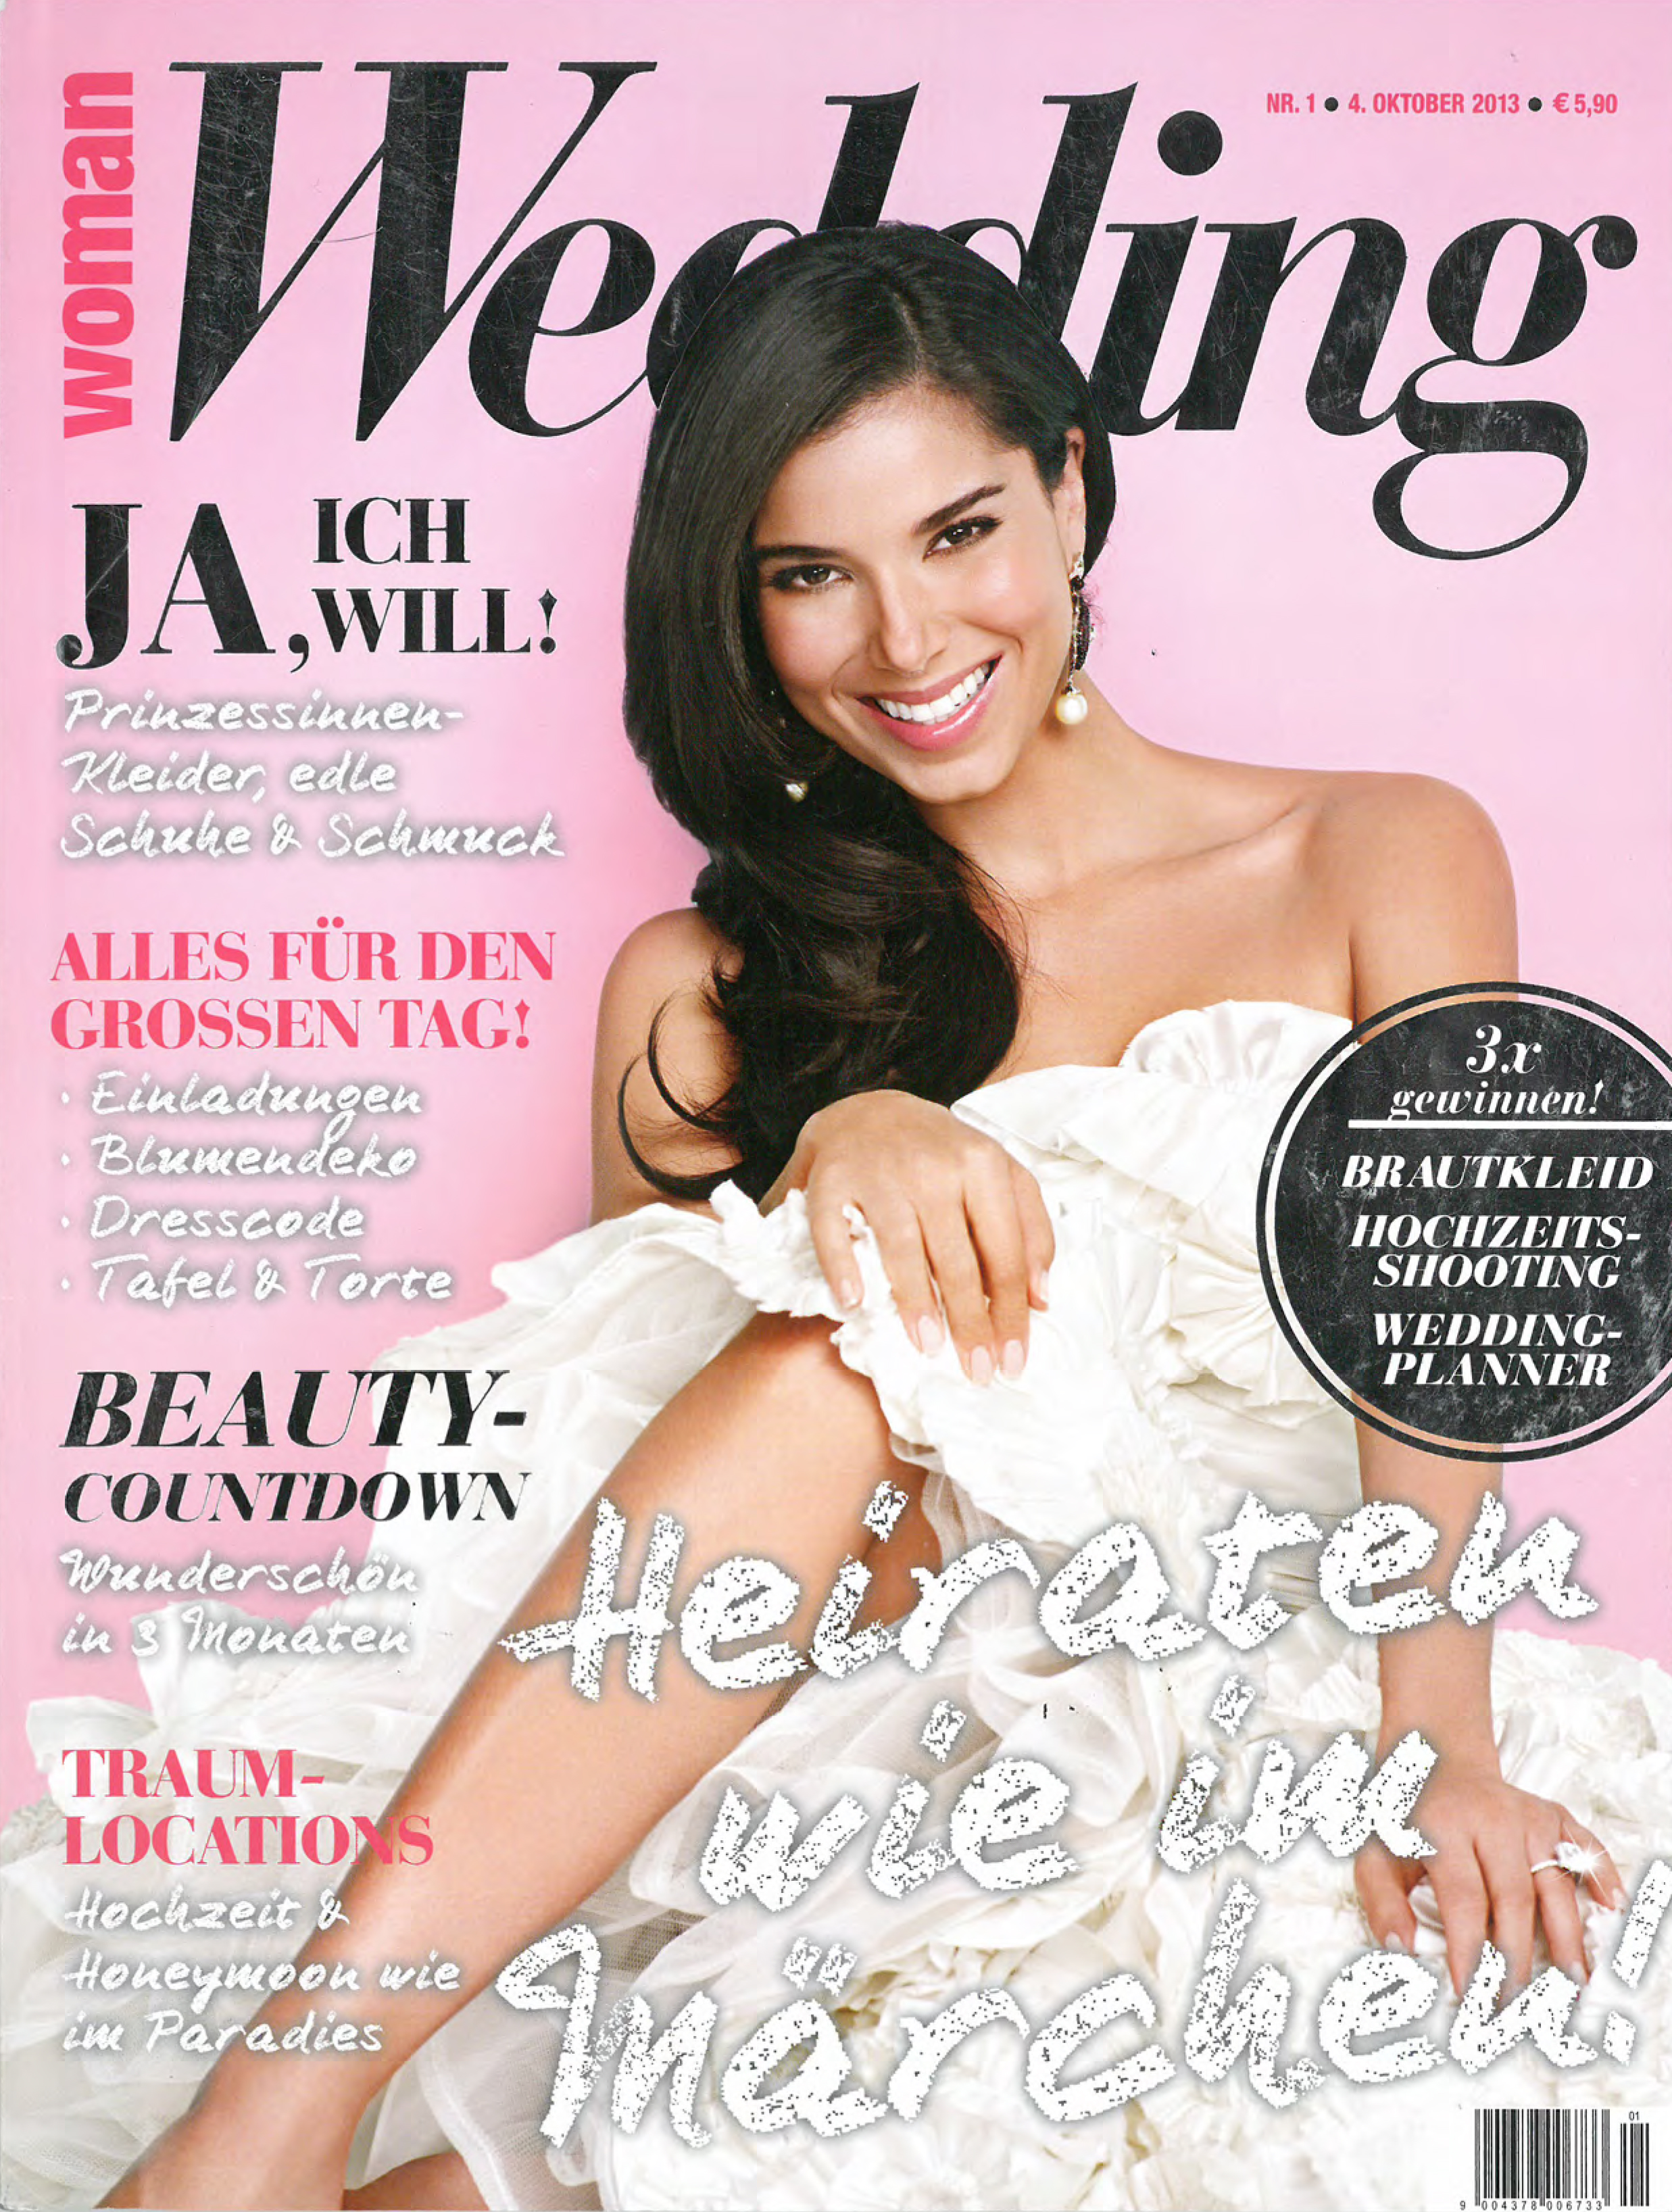 13.10.04_Woman_Wedding-1.jpg